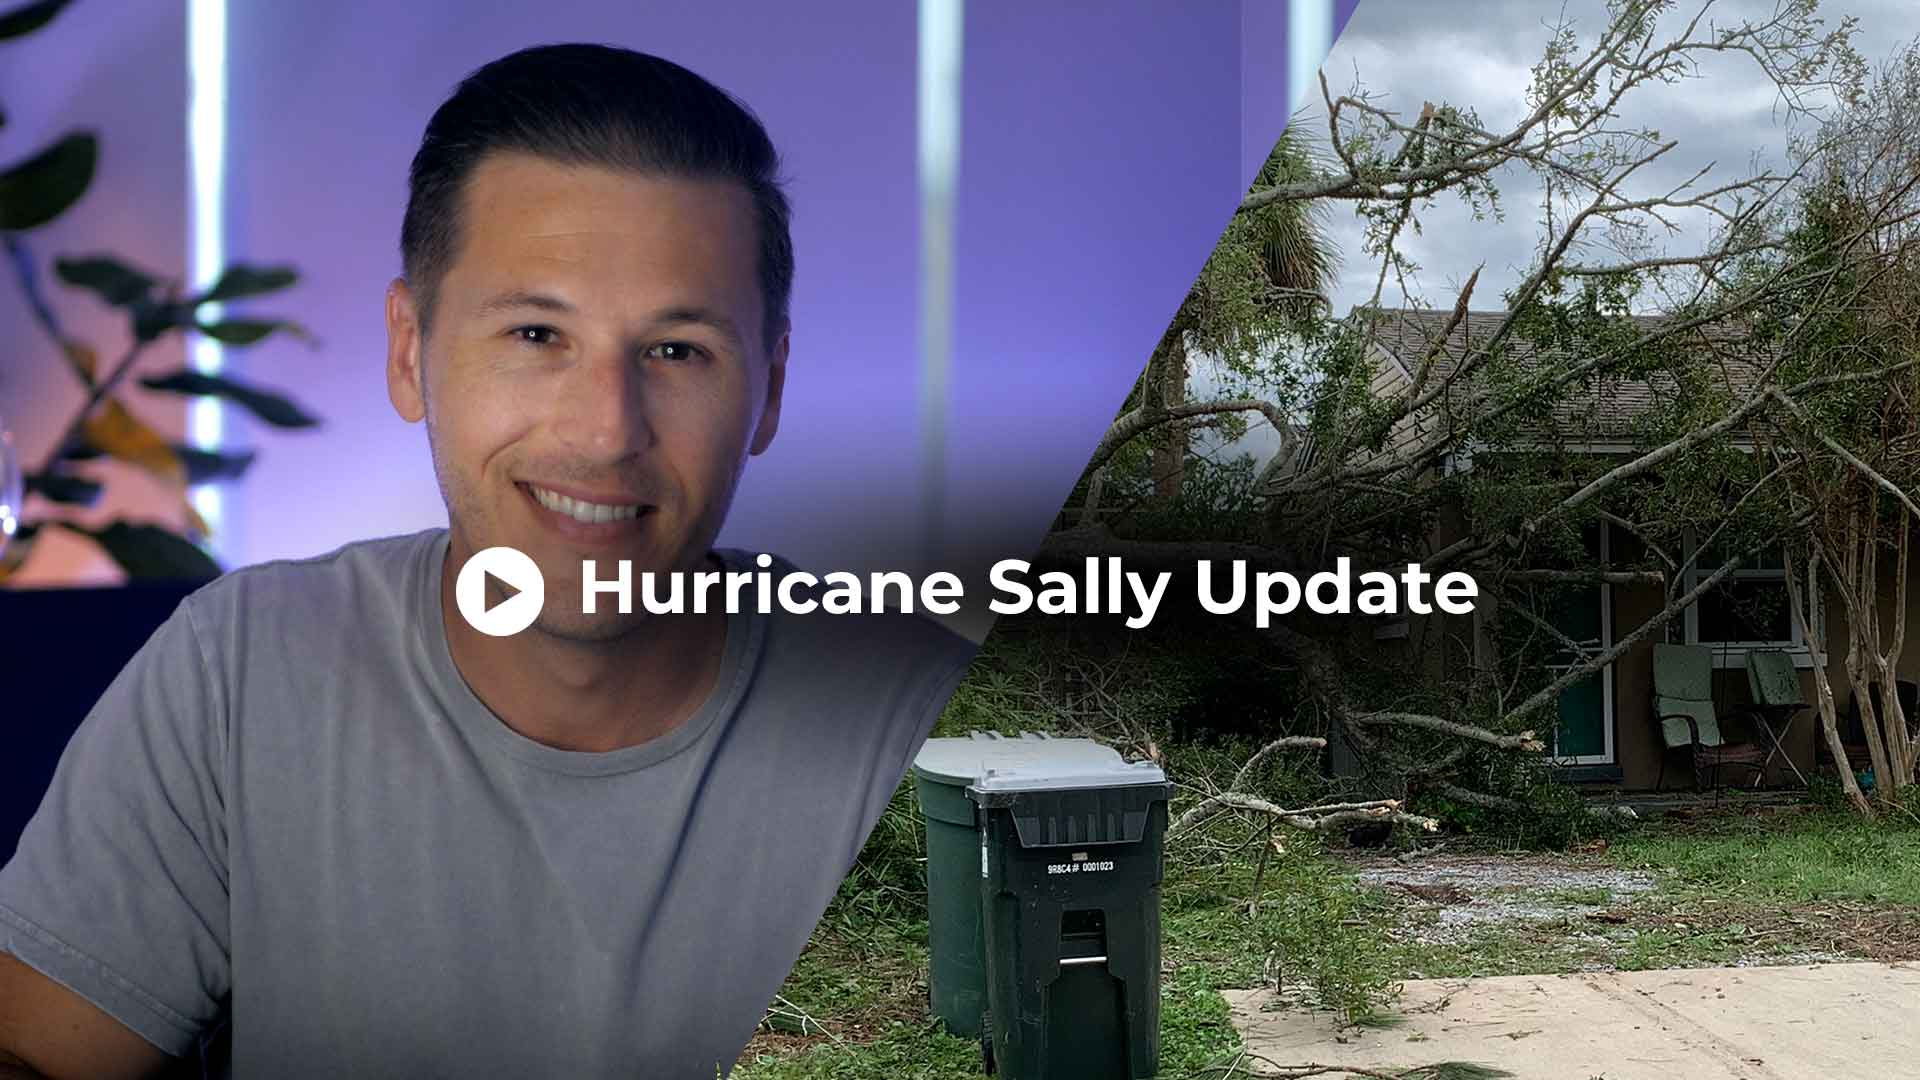 Hurricane Sally Update - Kyle Winkler MinistriesHurricane Sally Update